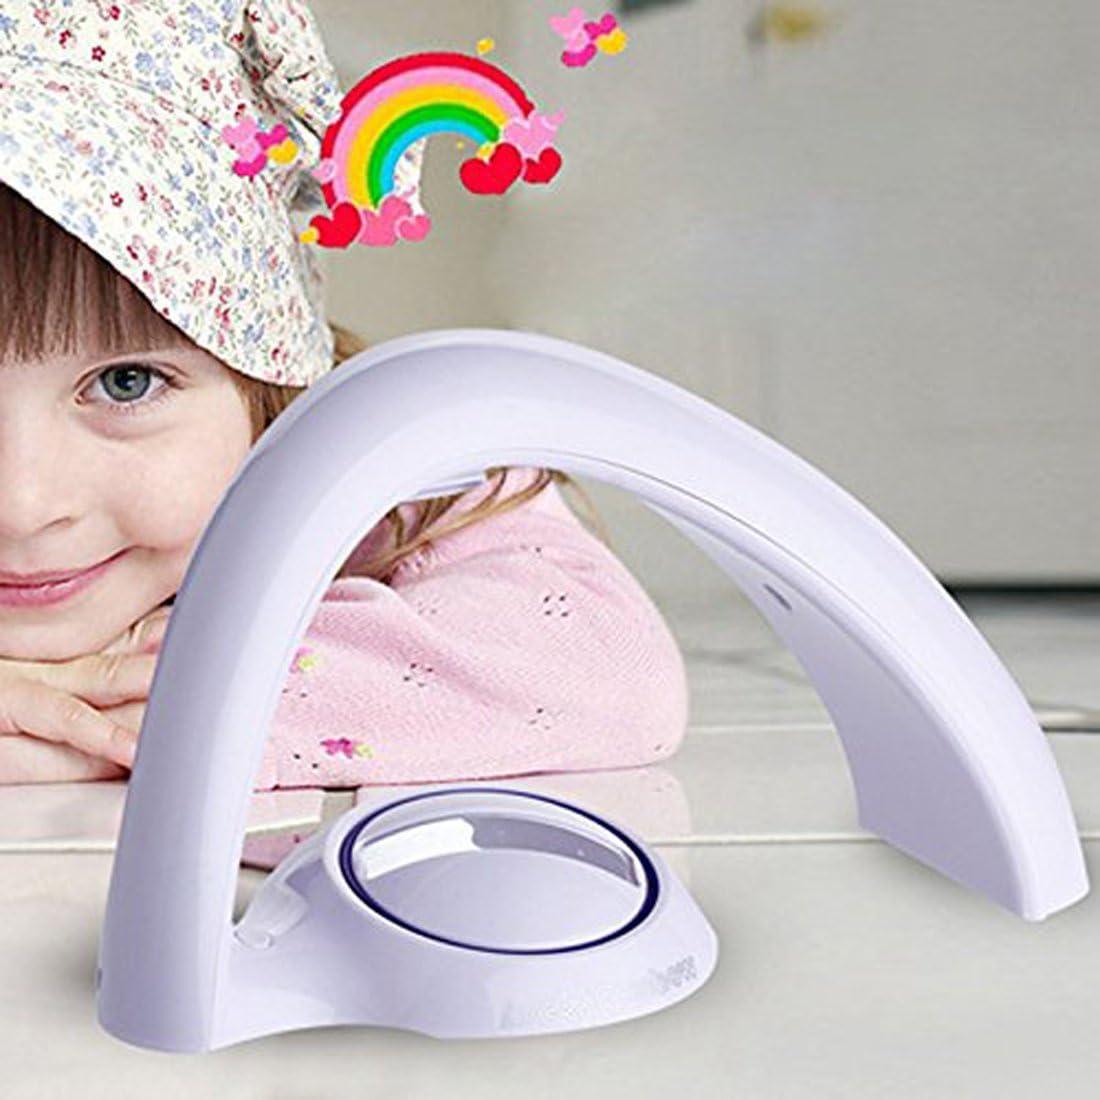 LED Kid Night Light Battery Bedroom Lamp Baby Children Rainbow Projector Light